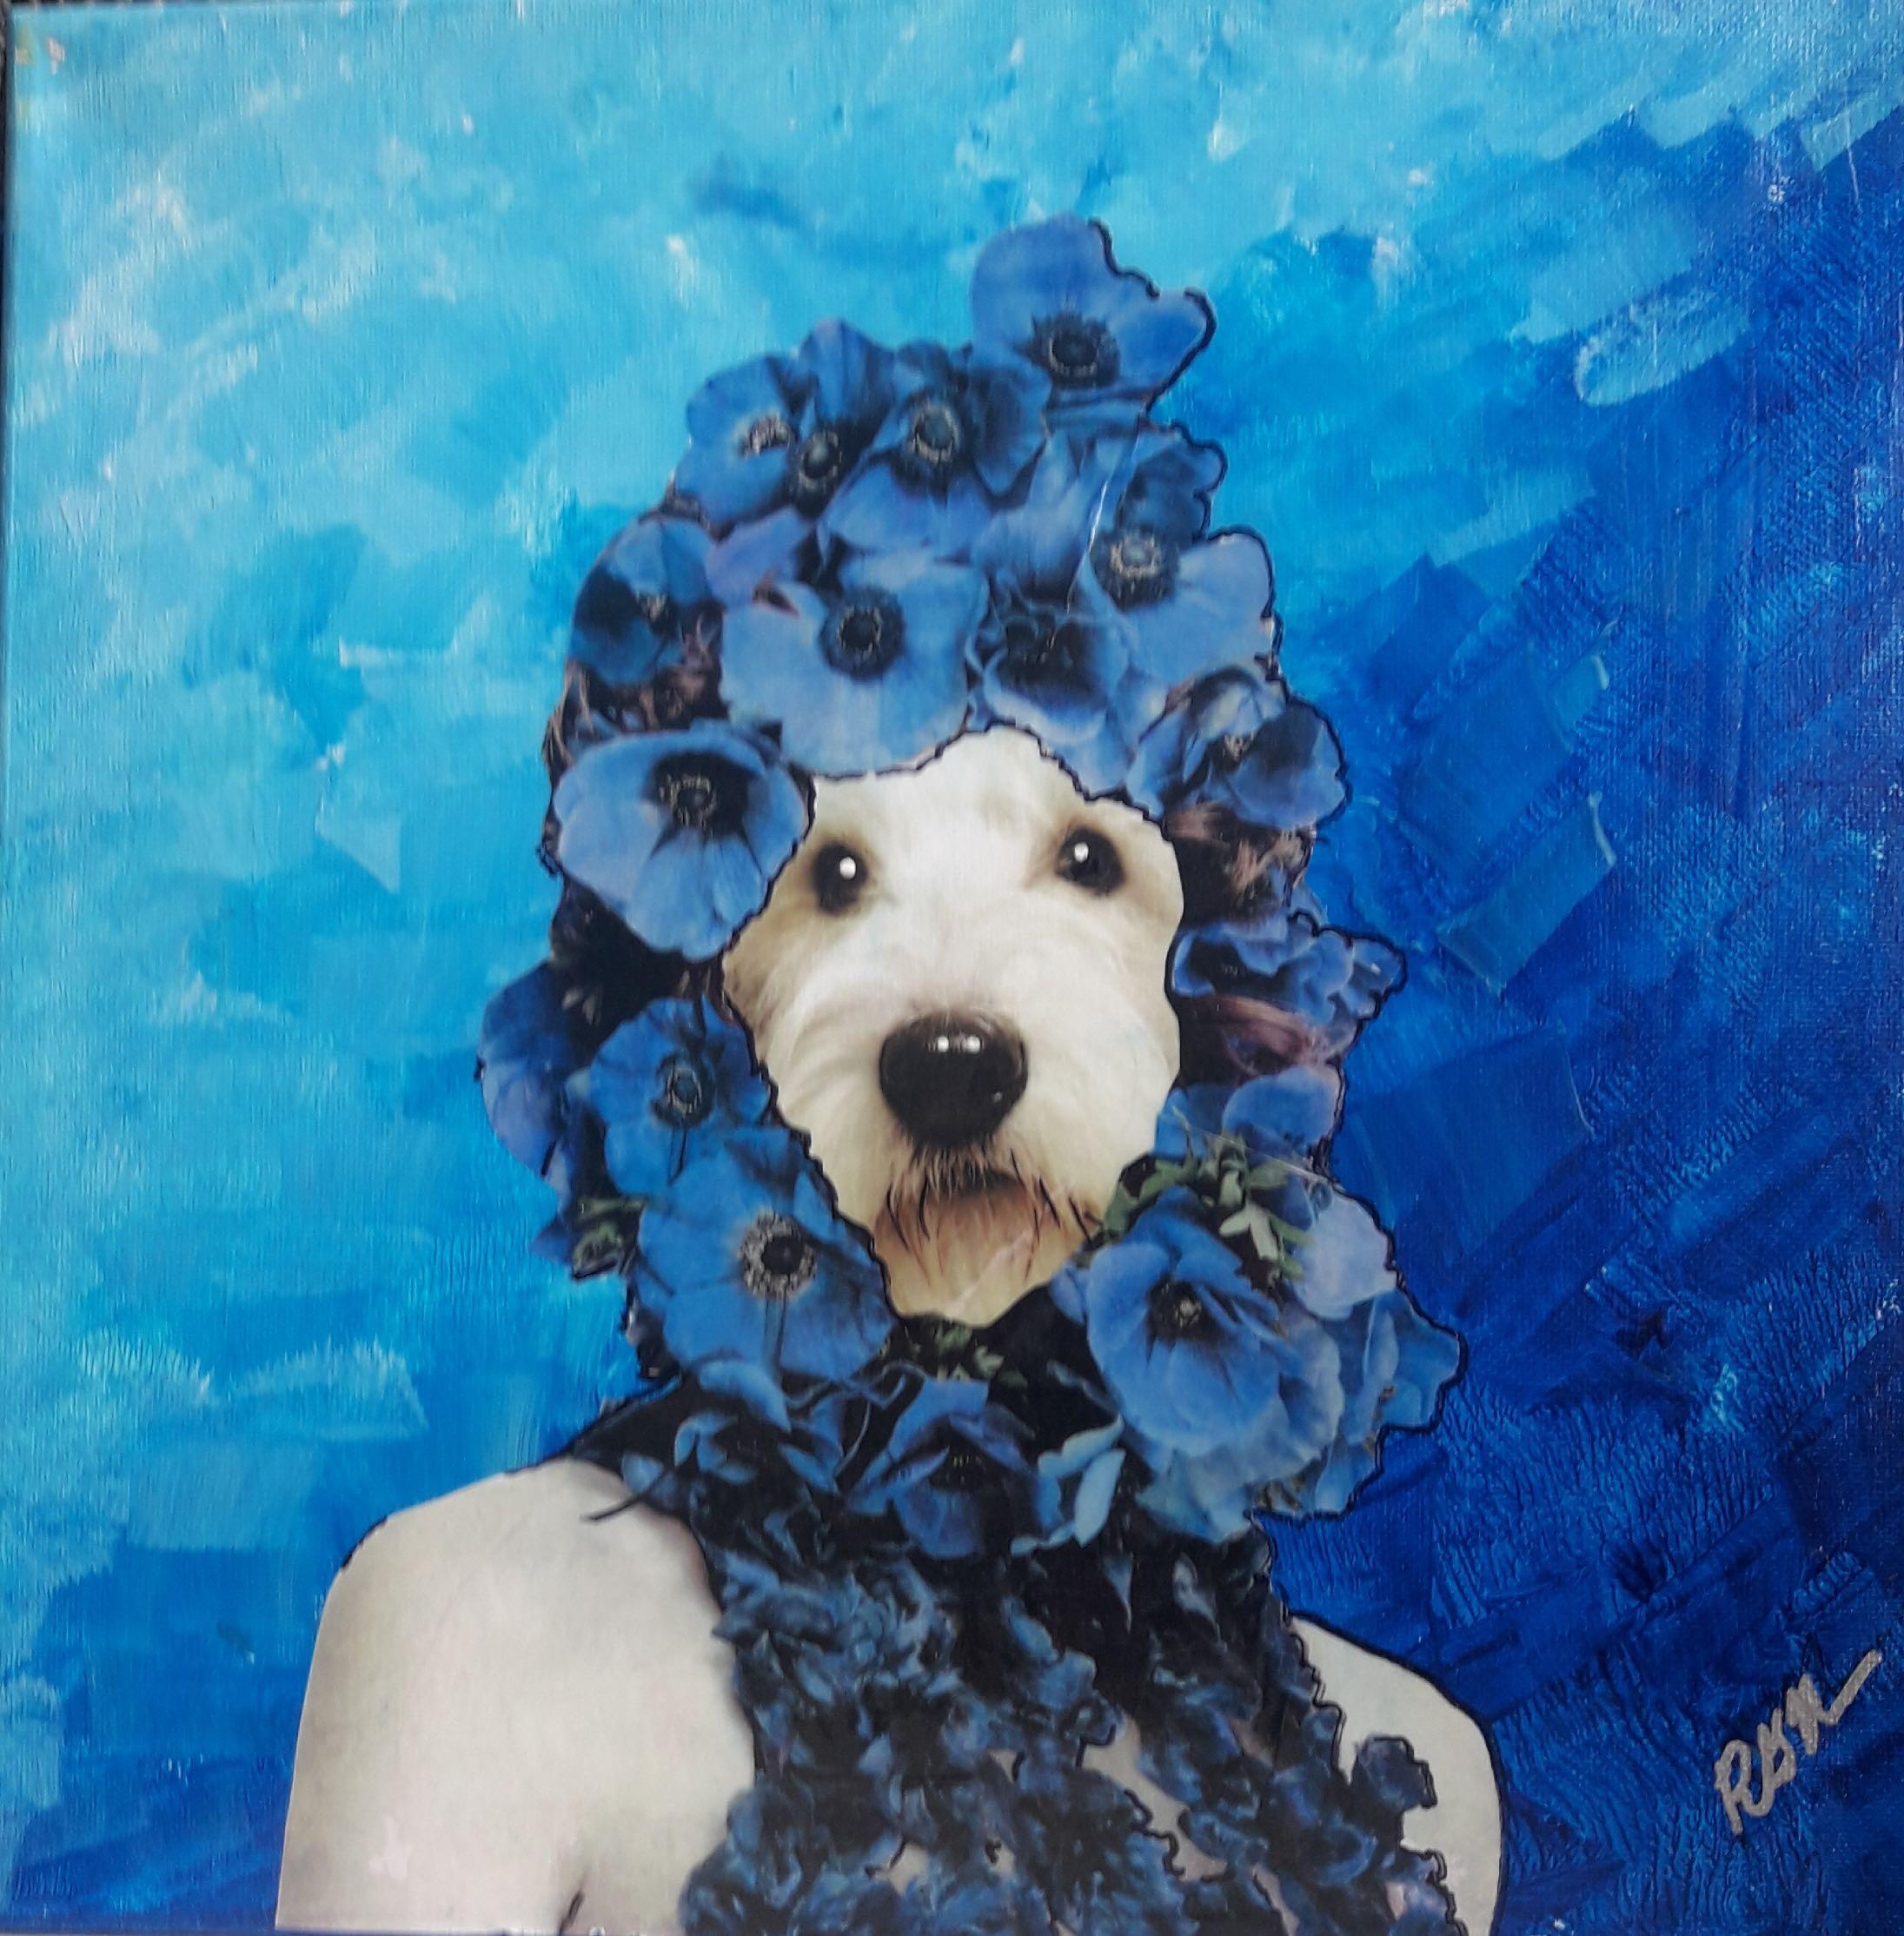 Blue Belle - golden doodle with blue flowers